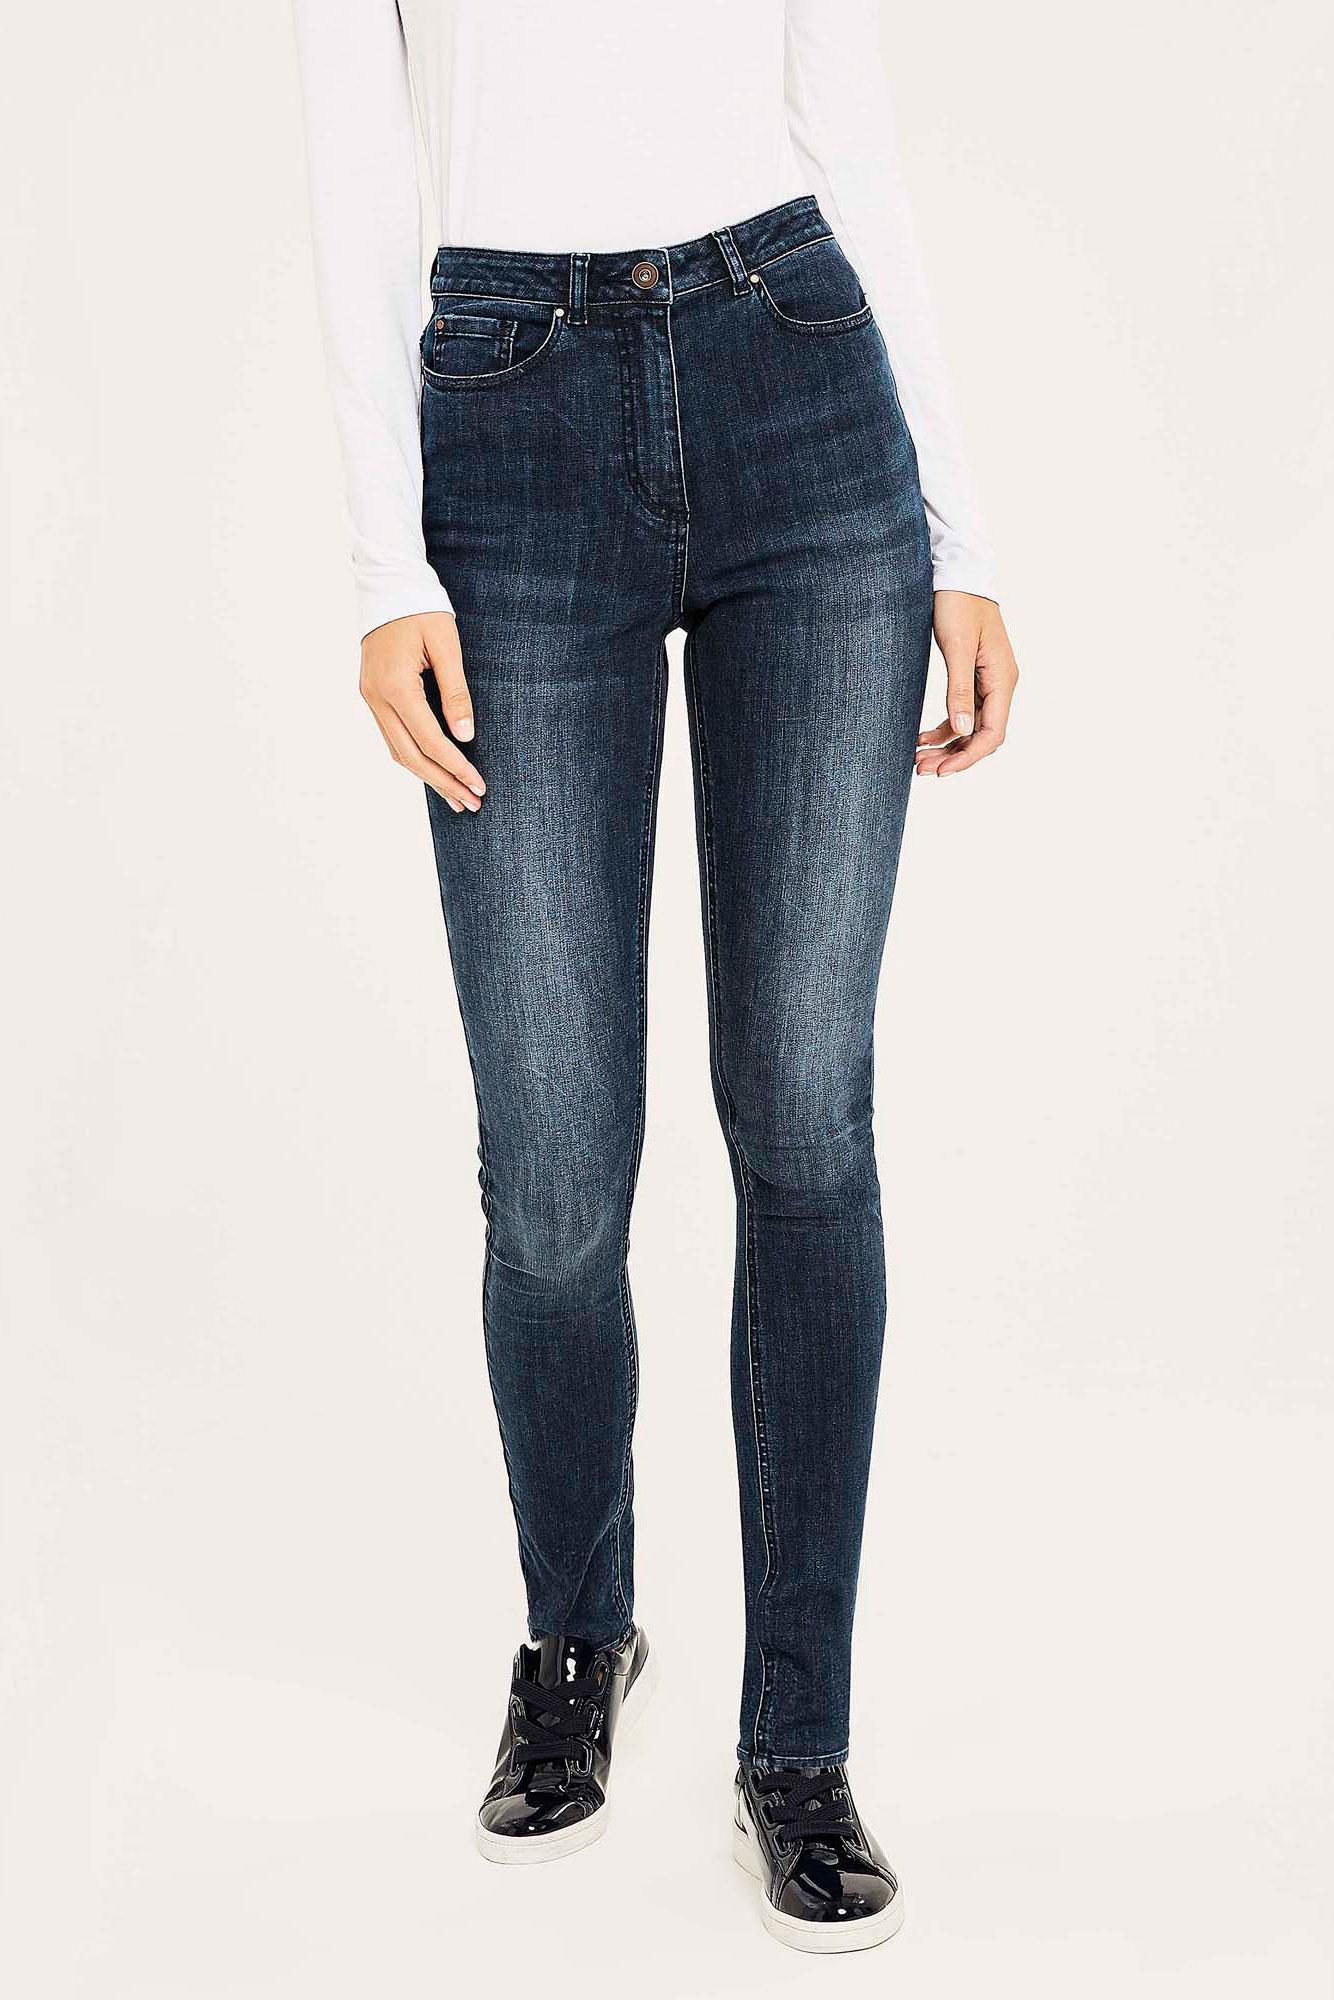 Dark Blue Wash Powerstretch Super Skinny Jeans